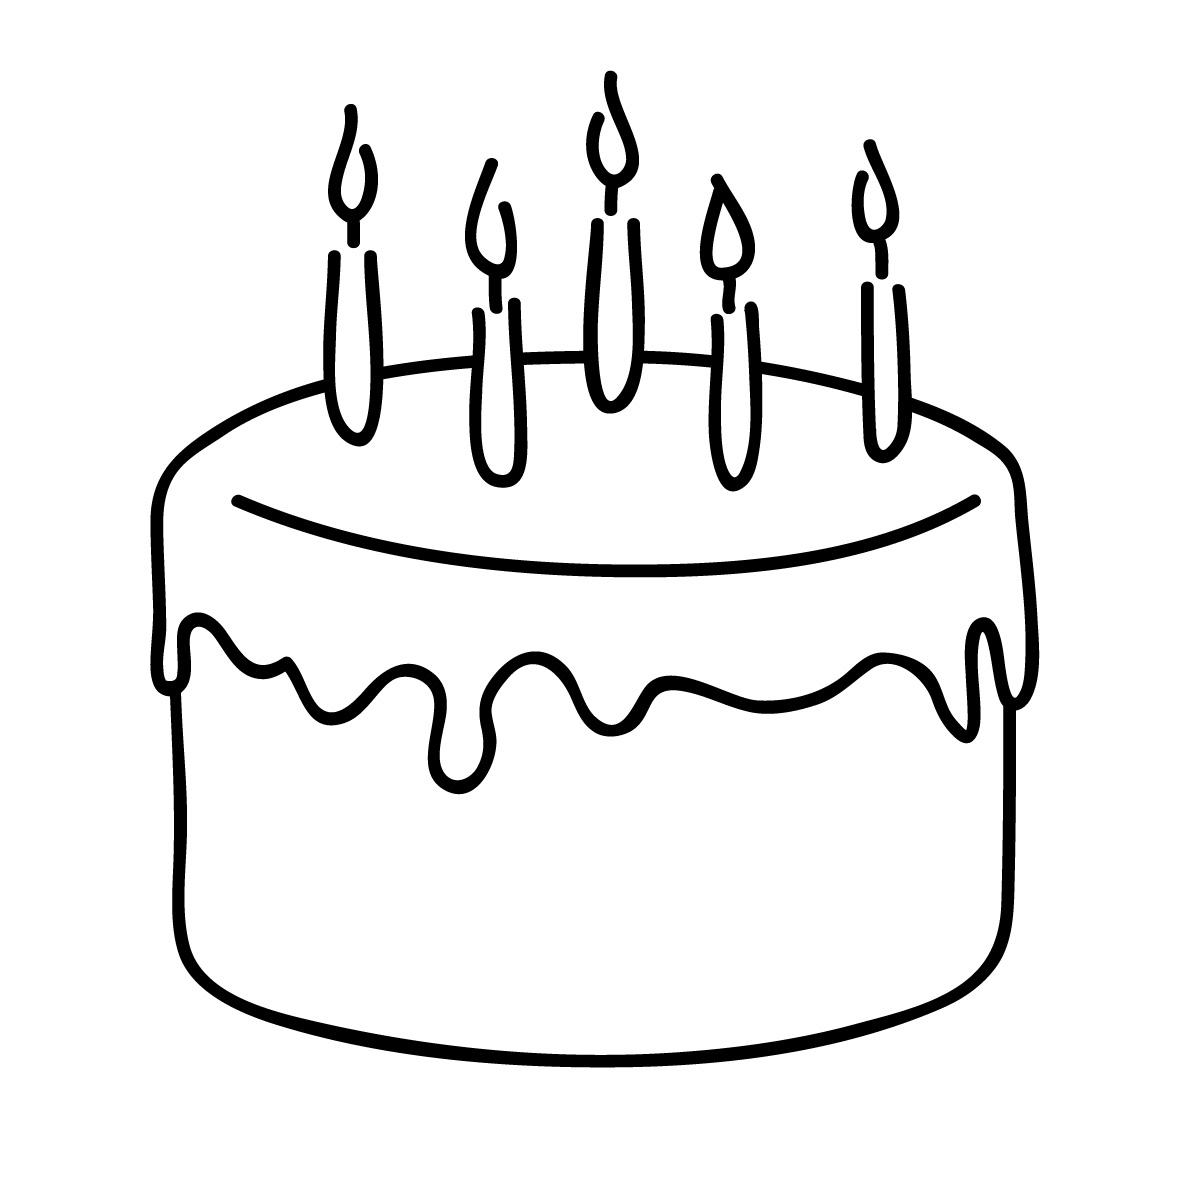 Birthday Cake Design Template : Birthday Cake Template - ClipArt Best